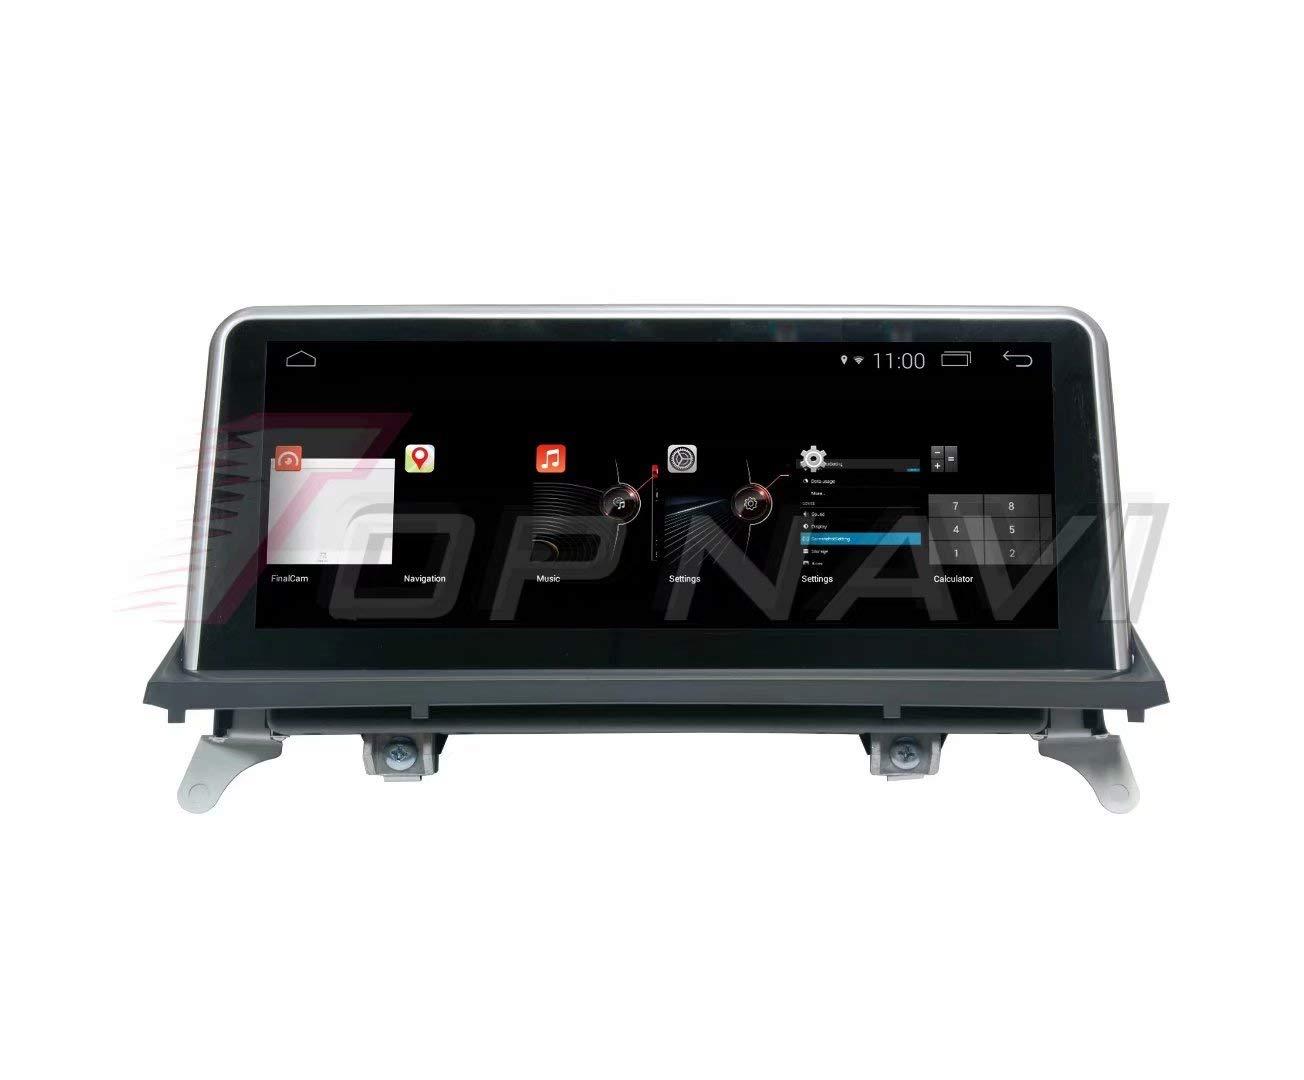 ... ROADYAKO Android 4.4 Reproductor de Coche para BMW X5 E70 F15 F85 2011 2012 X6 E71 F16 F86 2011 2012 Original con AUX GPS para automóvil Estéreo WiFi 3G ...